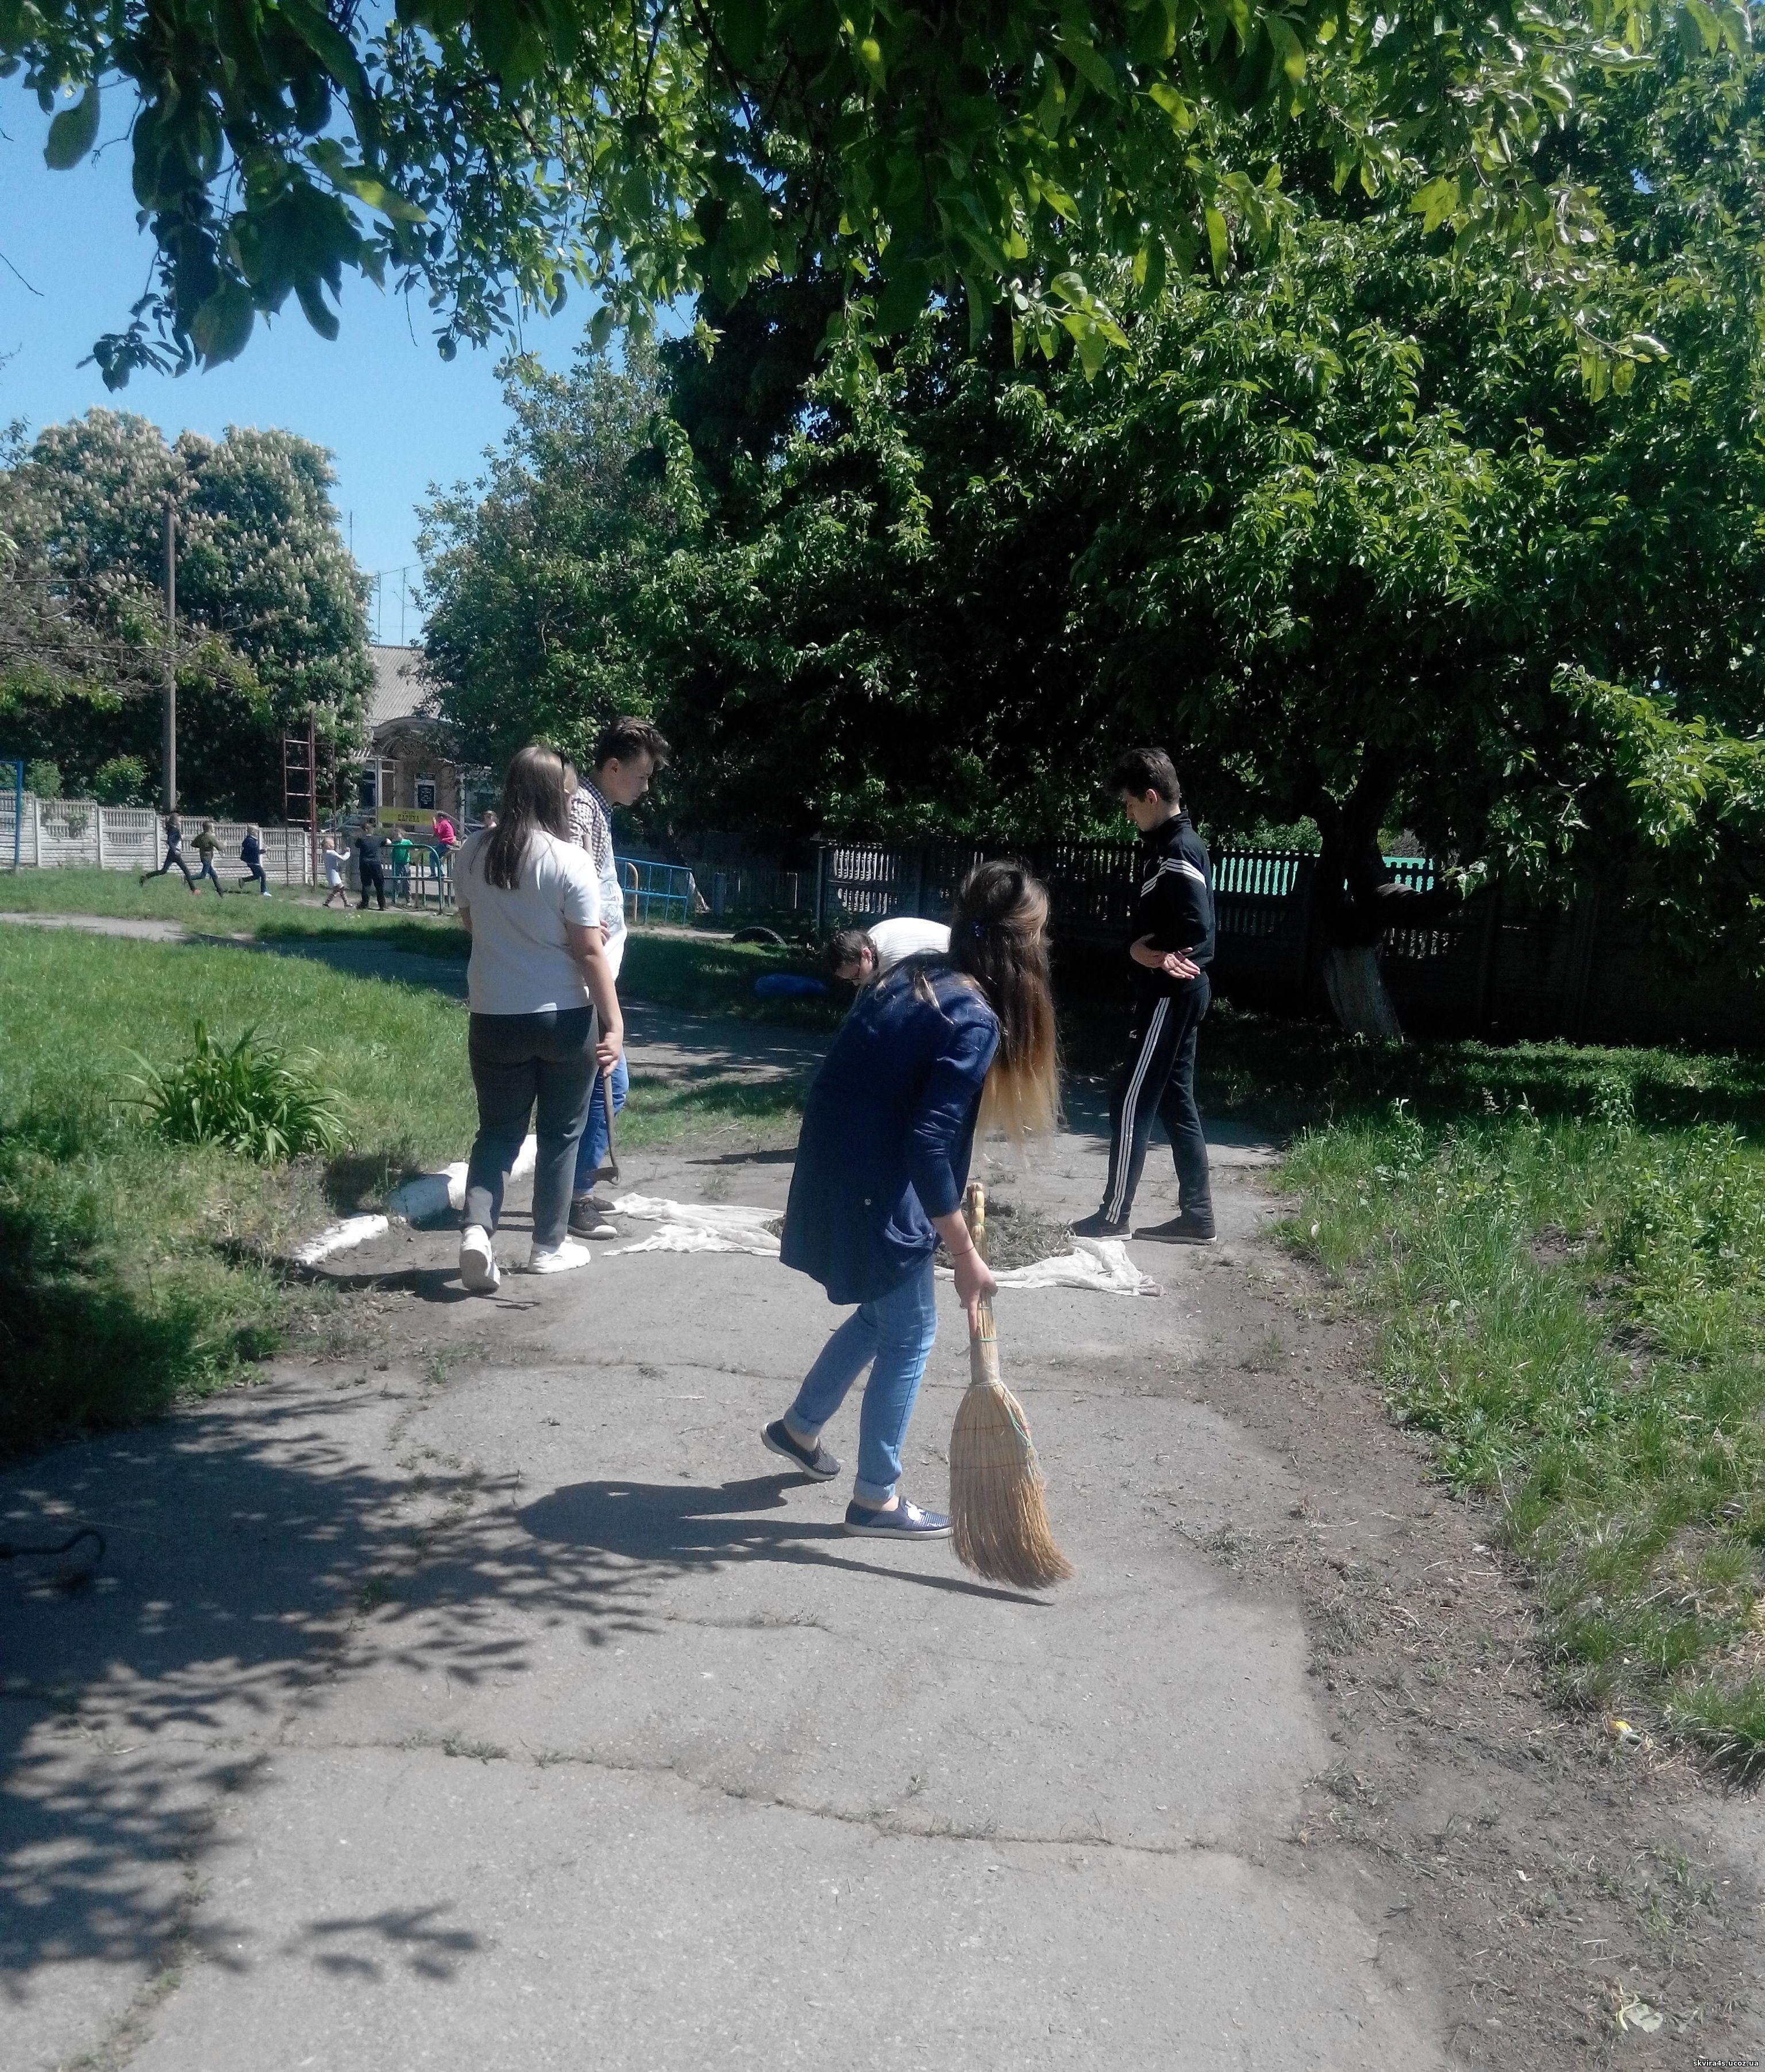 http://skvira4s.ucoz.ua/foto/23-05-17/2017523120907.jpg